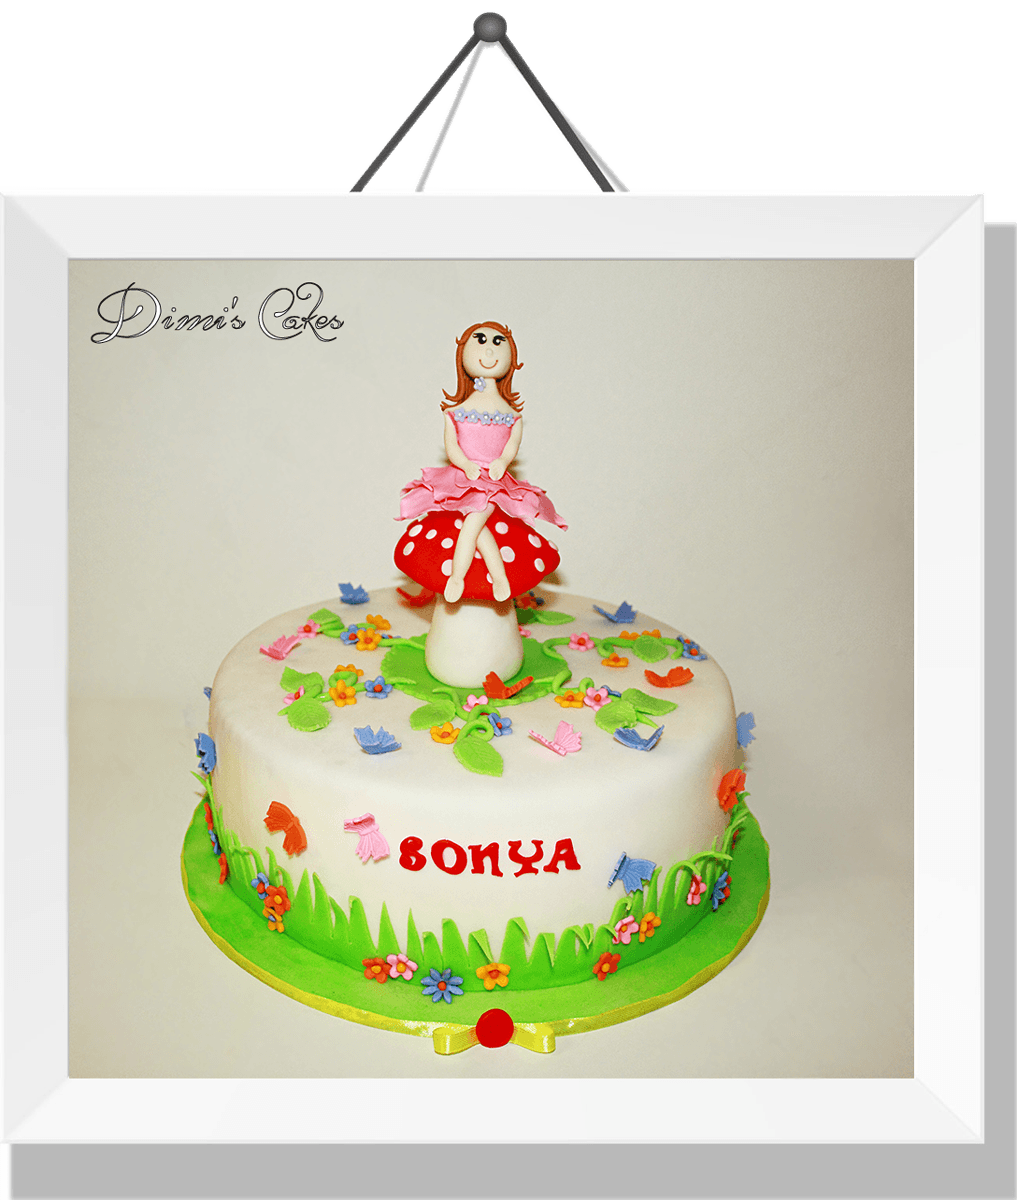 Sonya-min